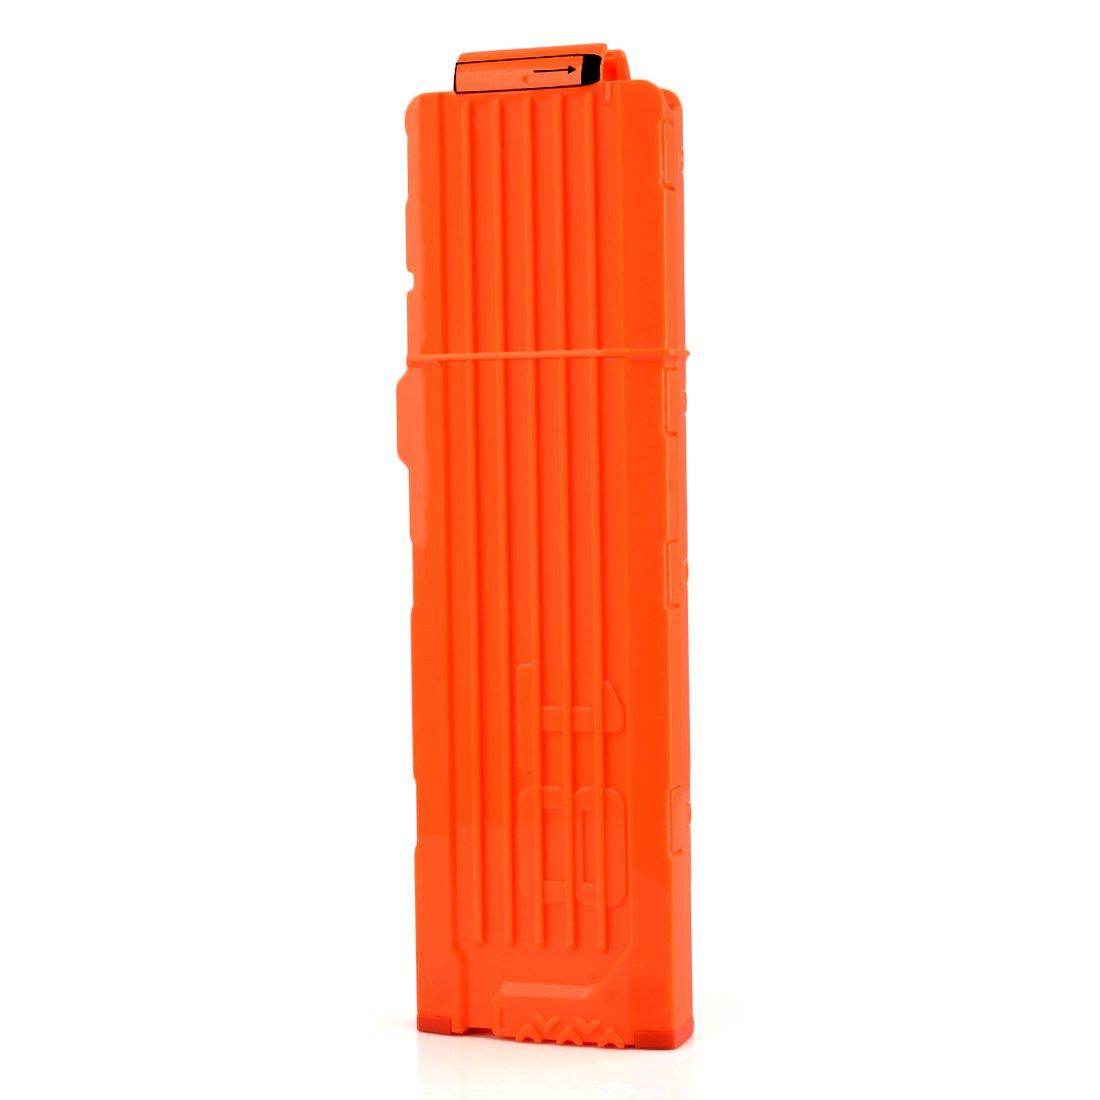 TXXCI Soft Bullet Clips For Nerf Toy 18 Bullets Ammo Cartridge Dart Nerf Clips - Orange